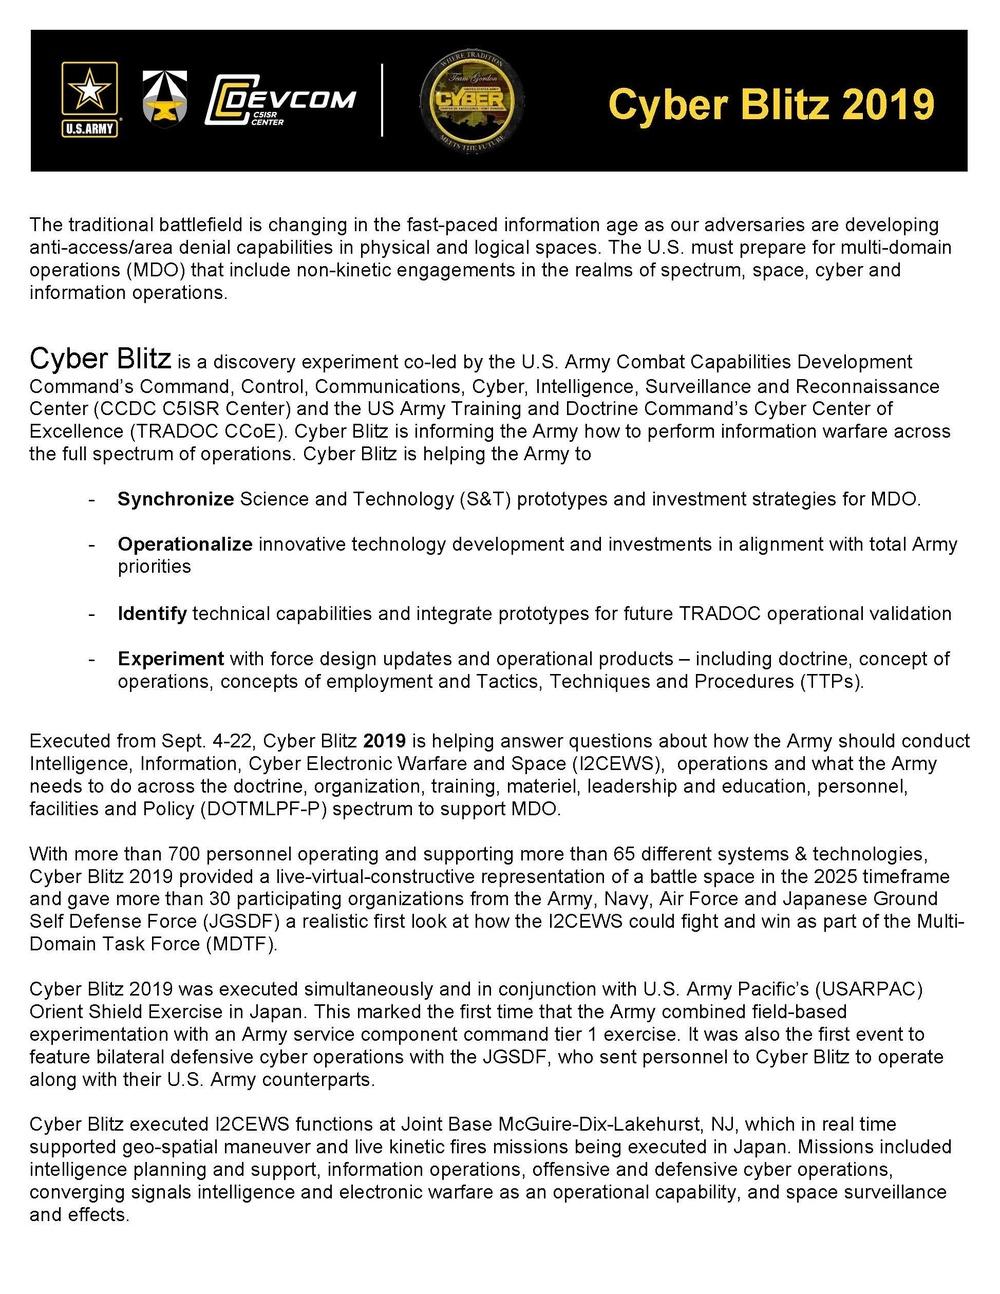 Cyber Blitz 2019 Factsheet